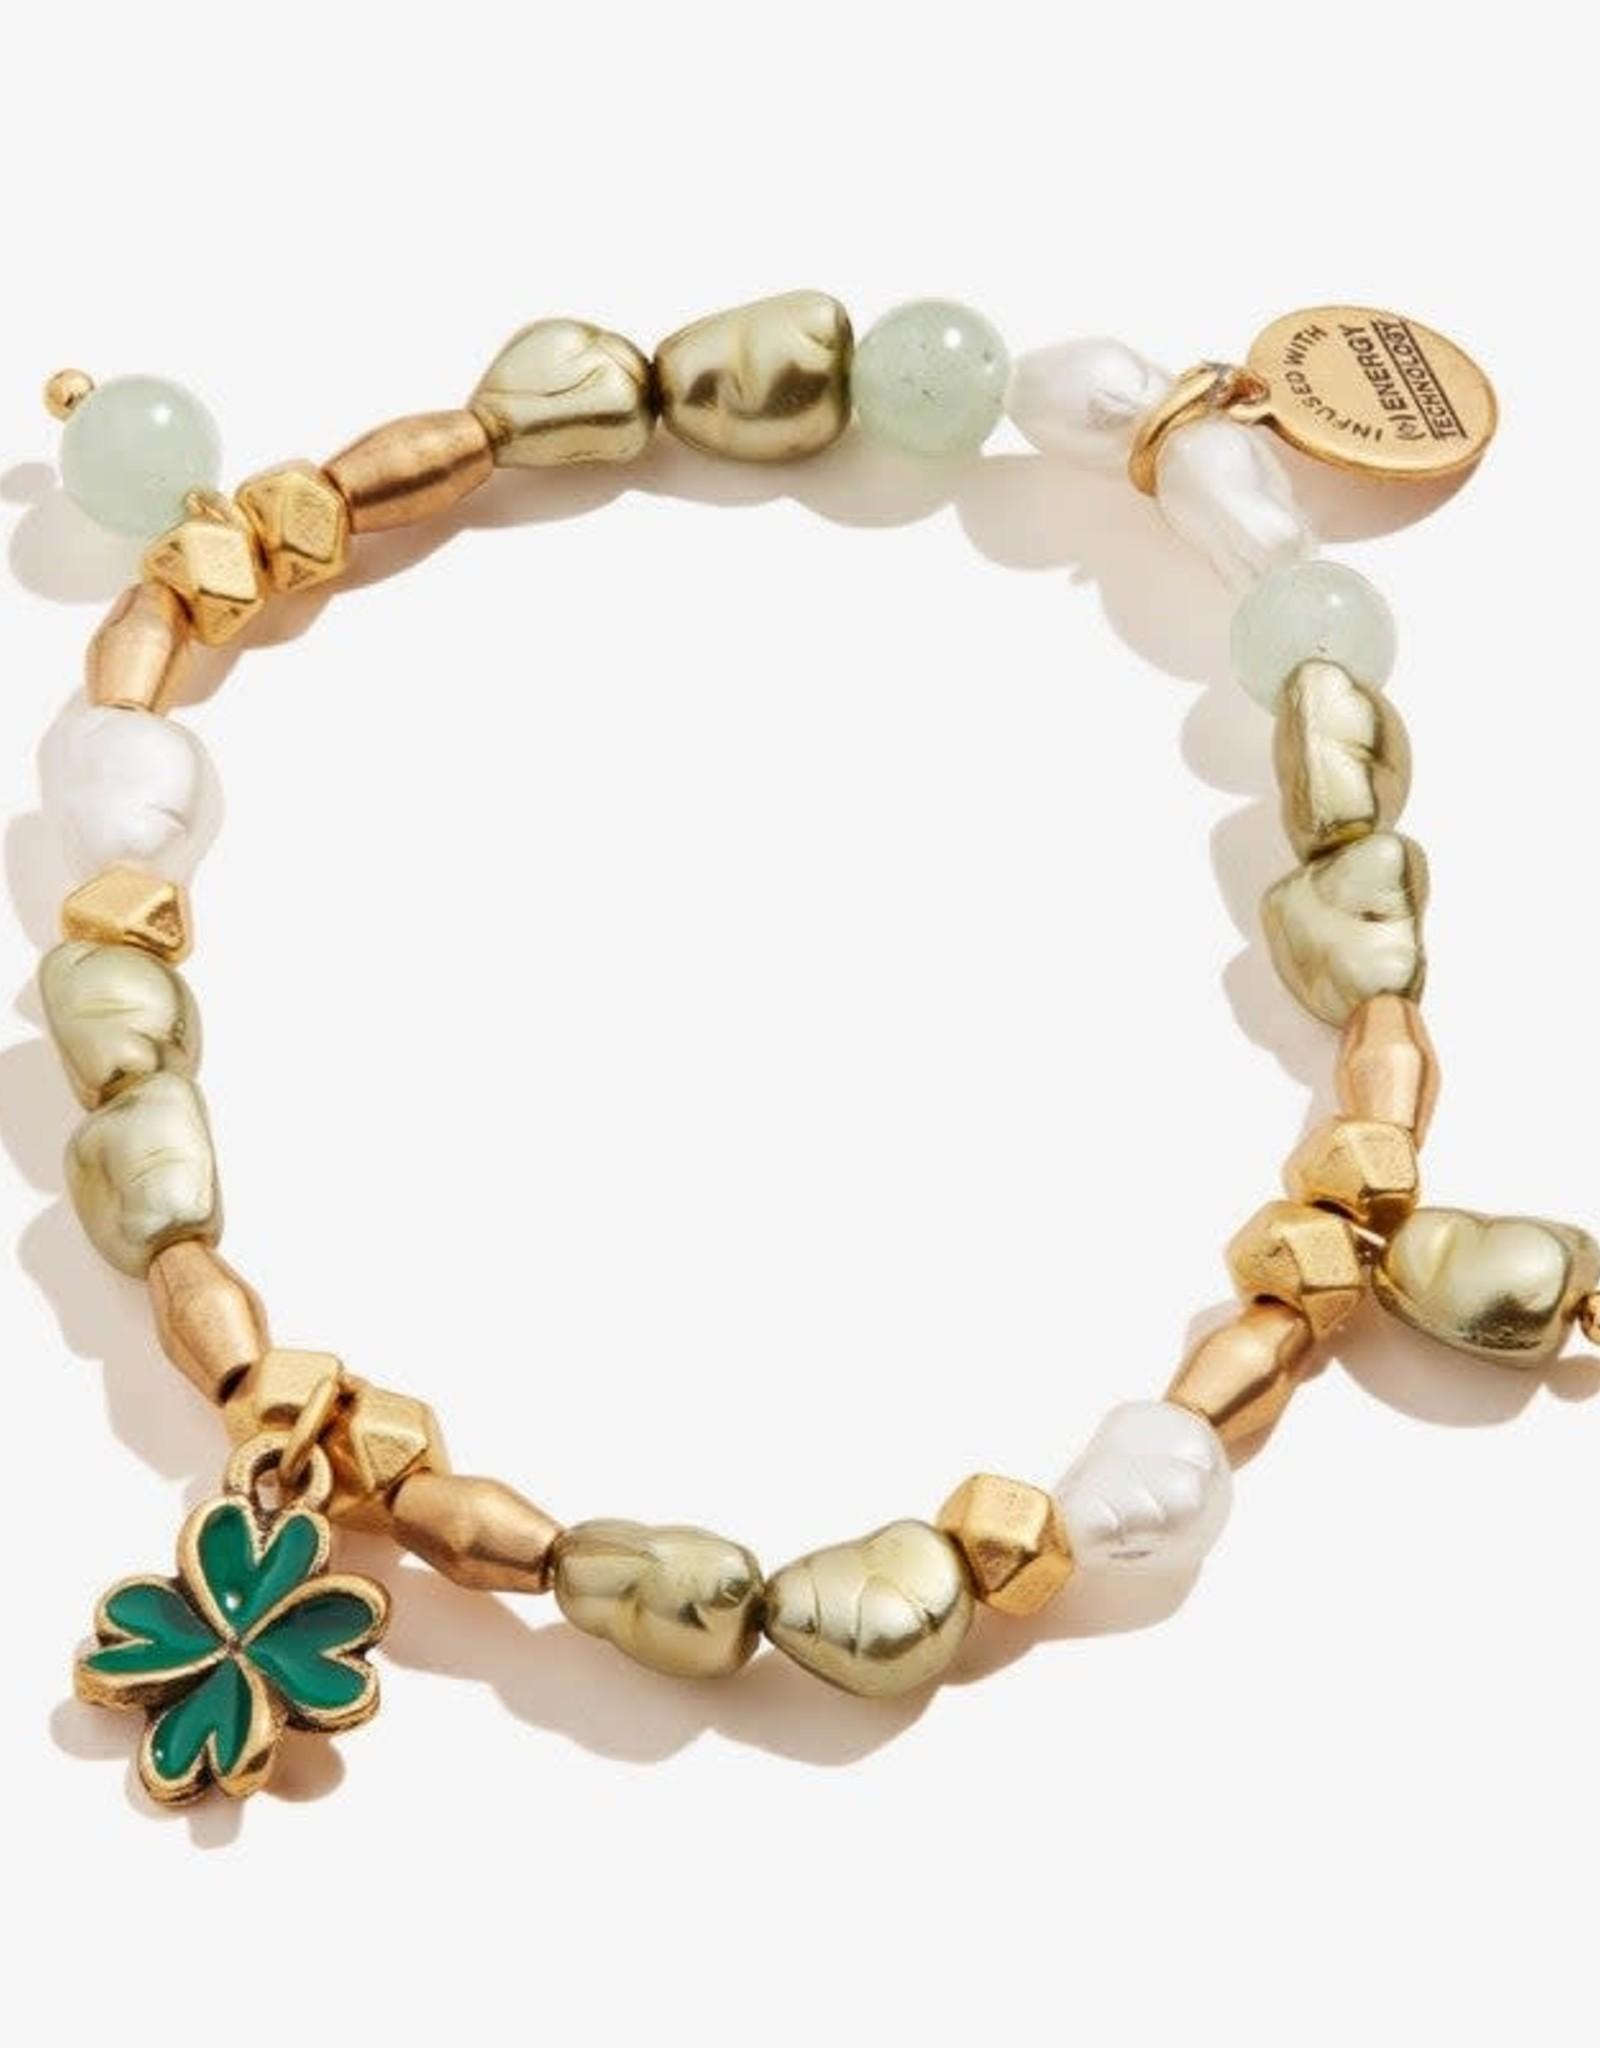 Alex and Ani Four Leaf Clover Beaded Charm Stretch Bracelet Shiny Gold FINAL SALE